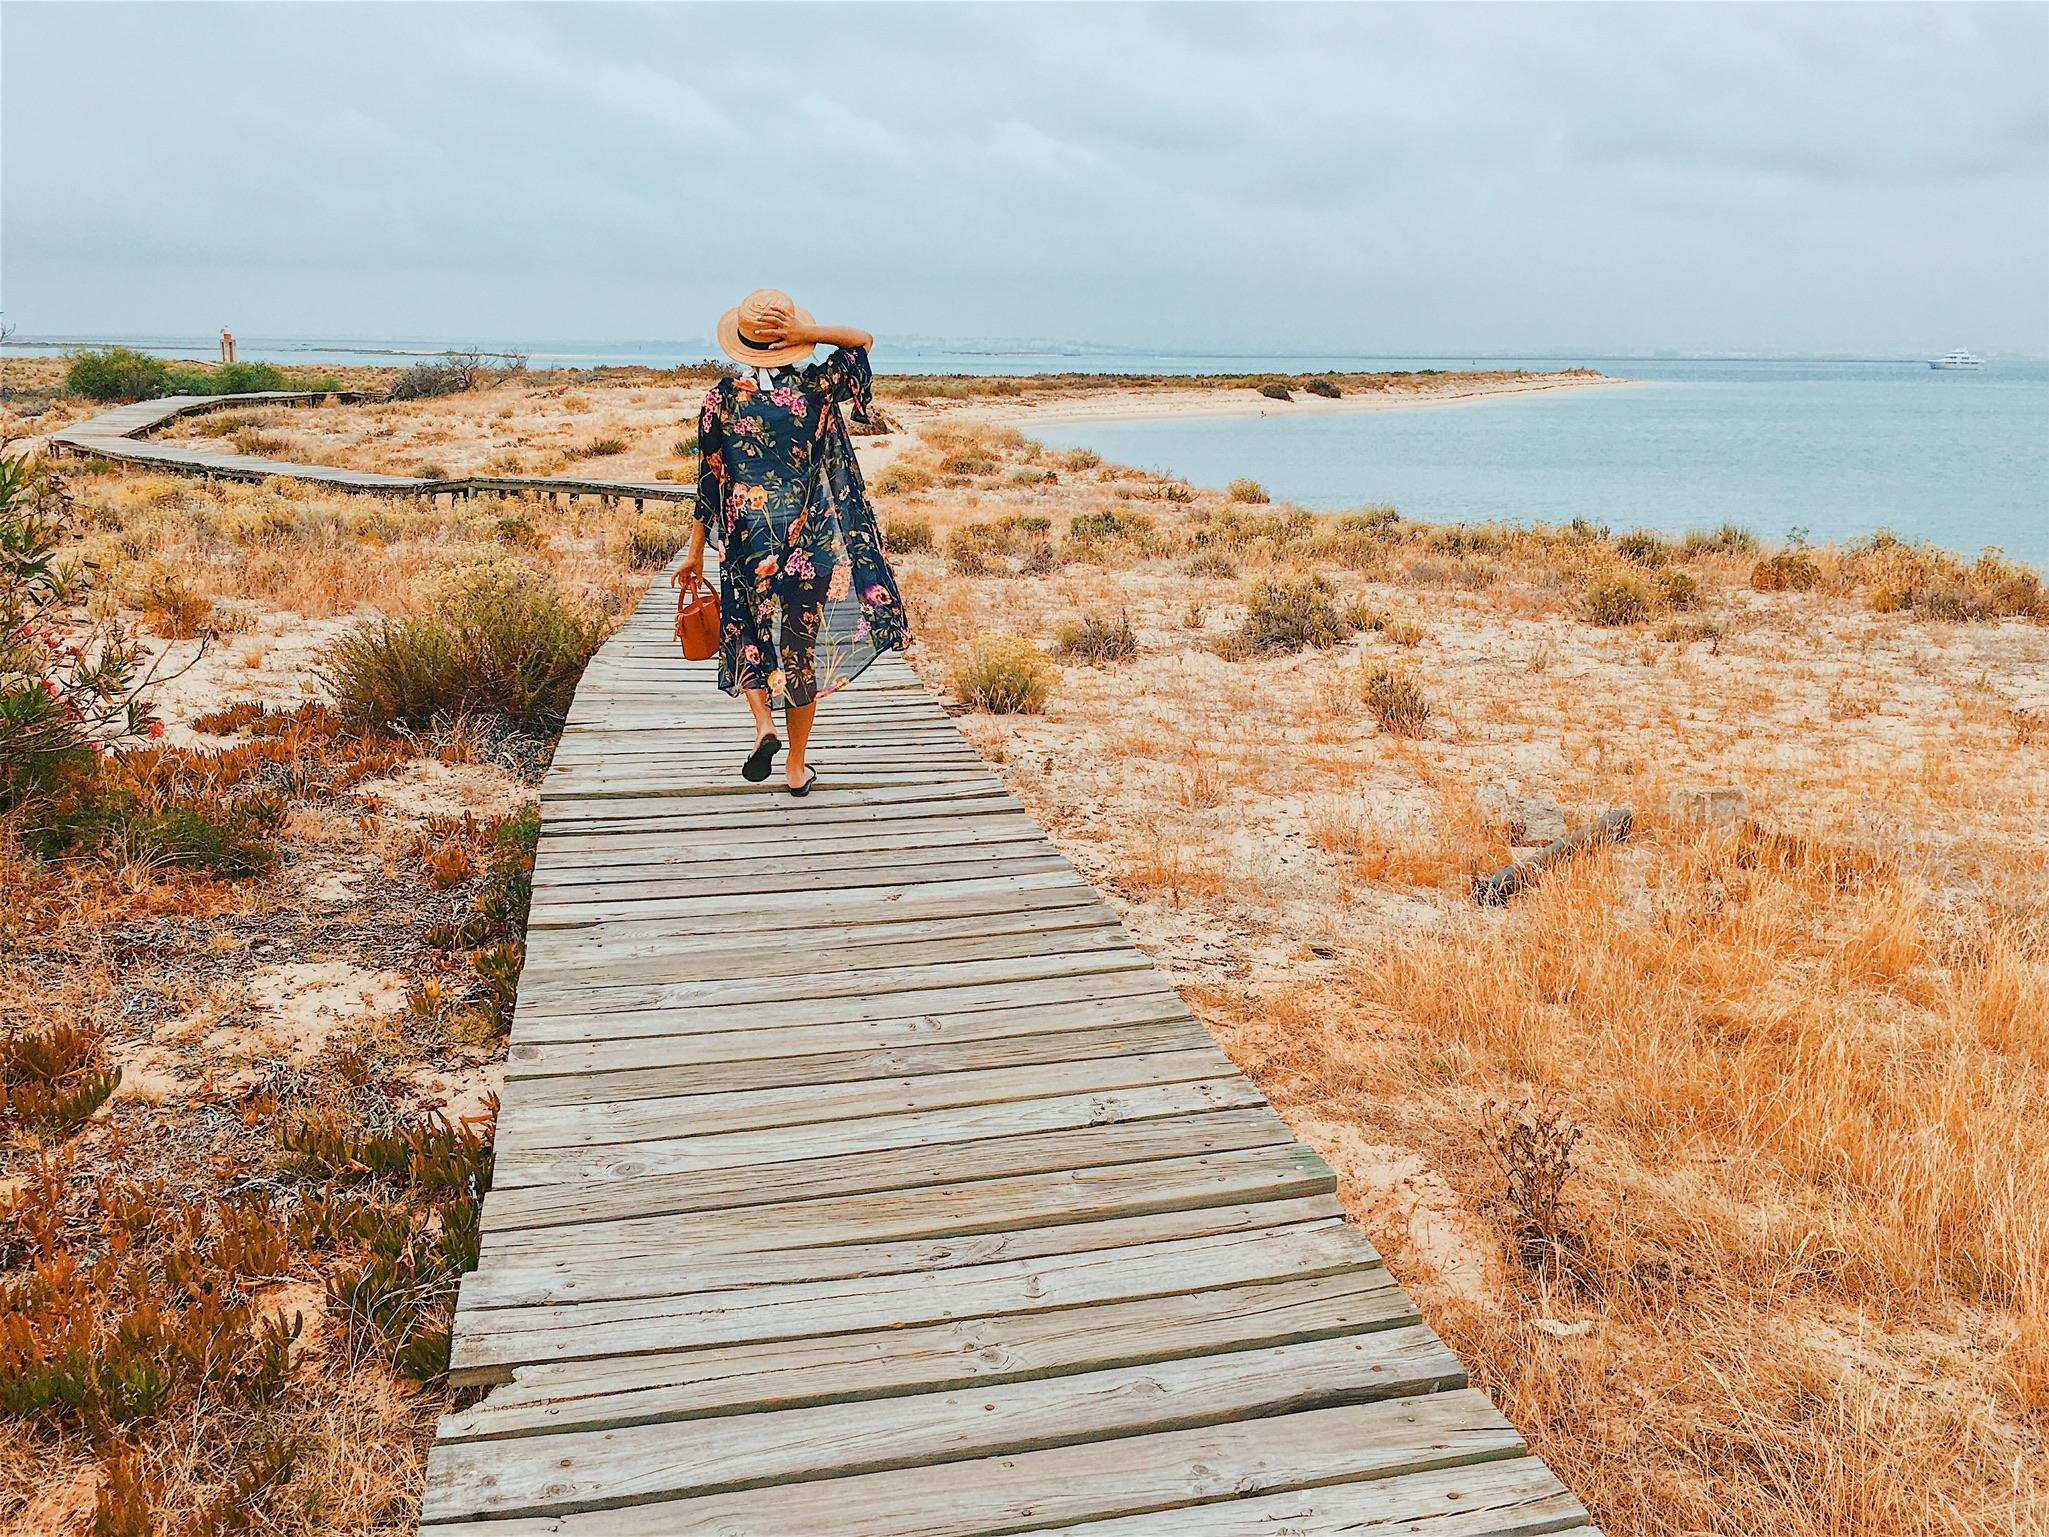 Walking along one of the many wooden plank walkways on Ilha Deserta